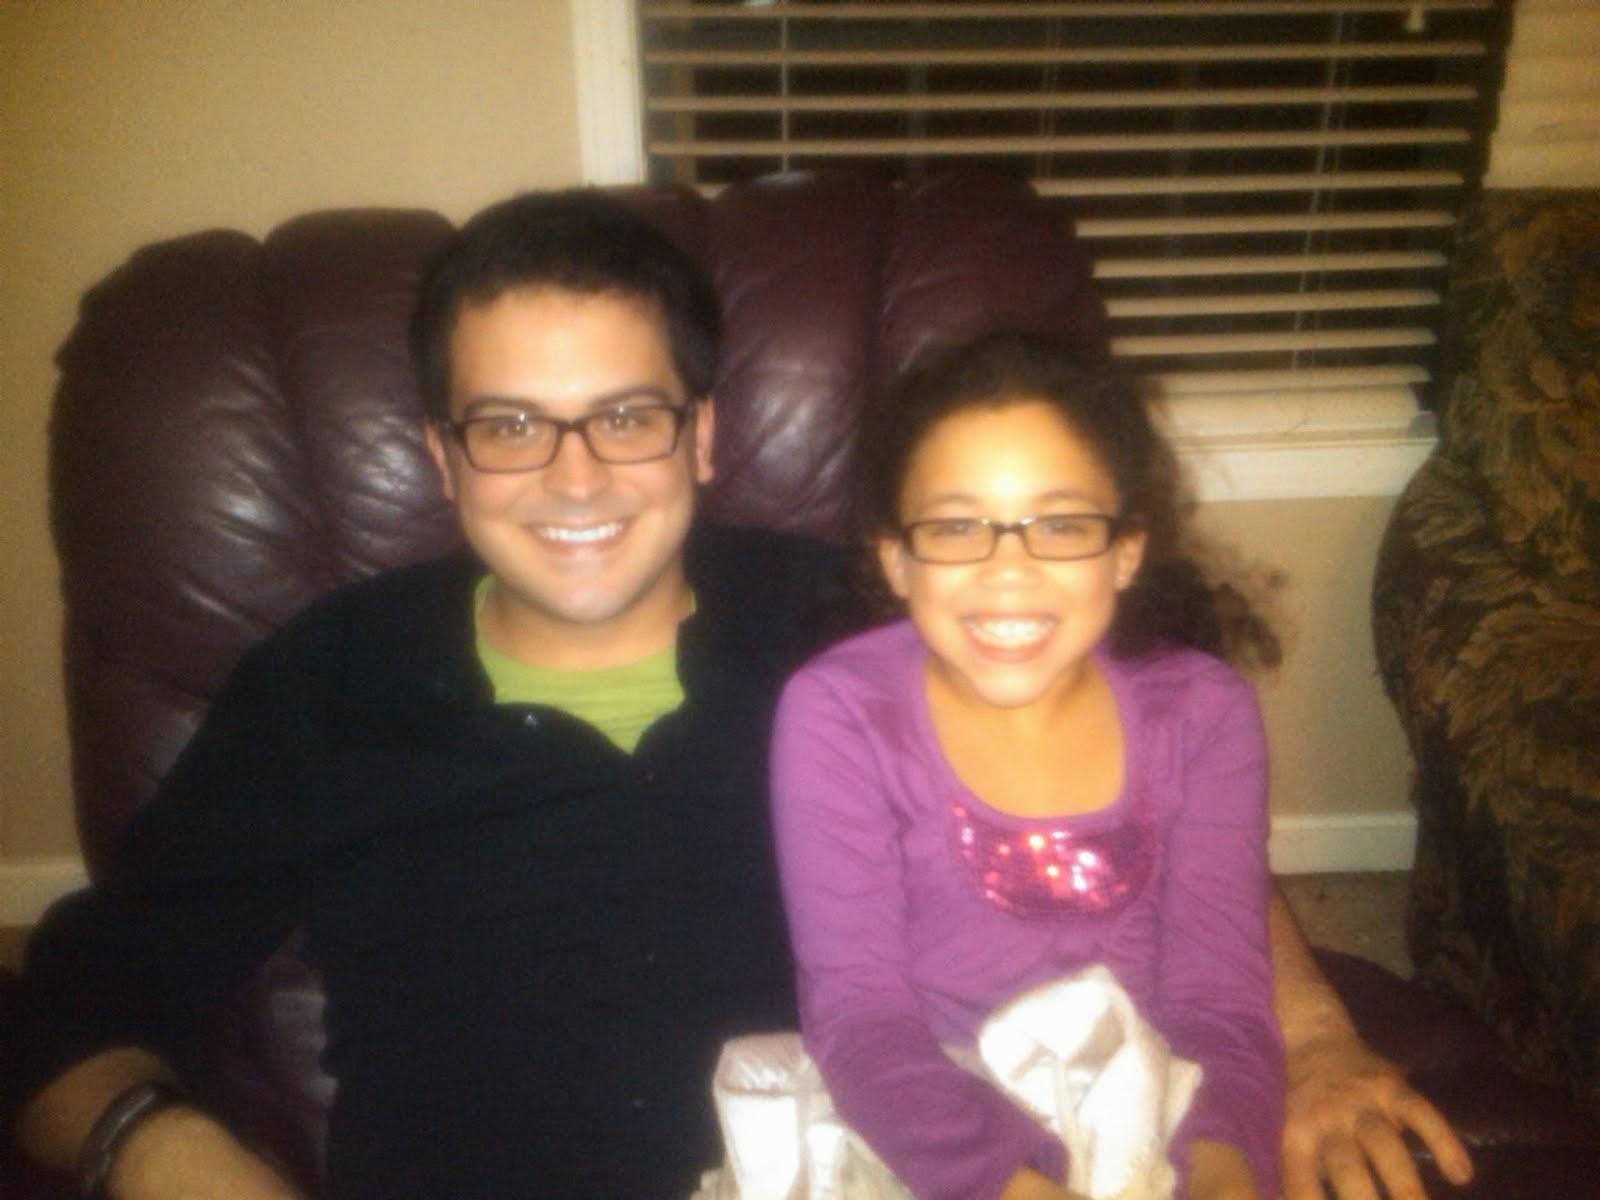 Jason and Carmen